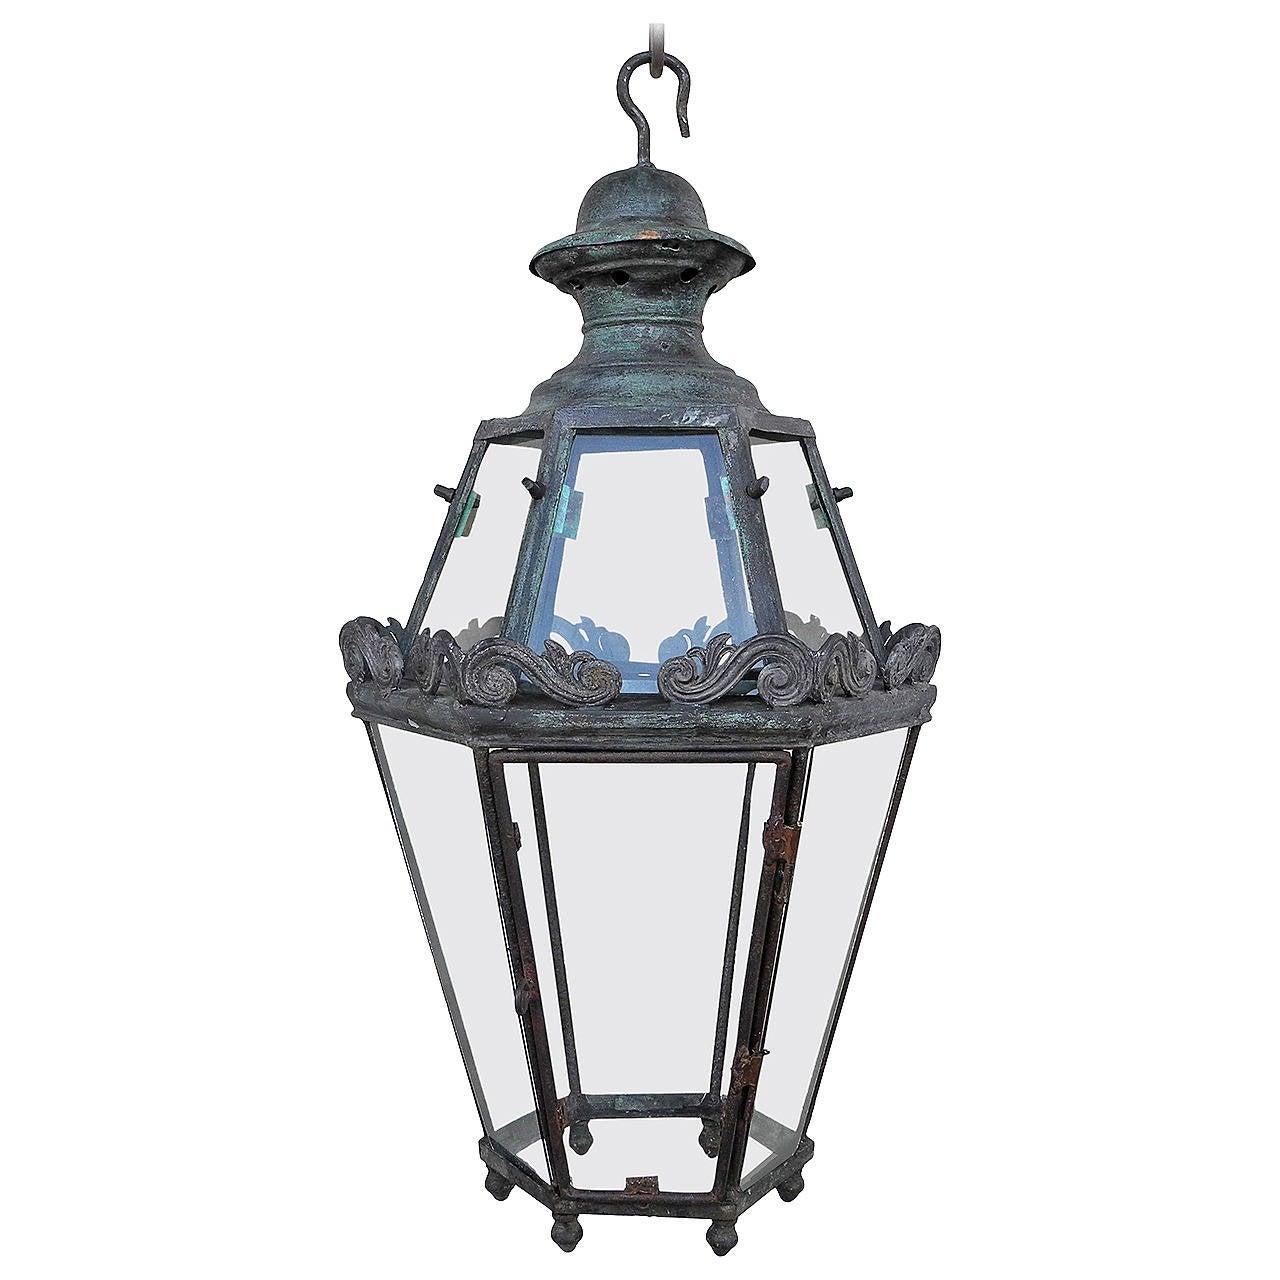 18th Century French Lantern at 1stdibs